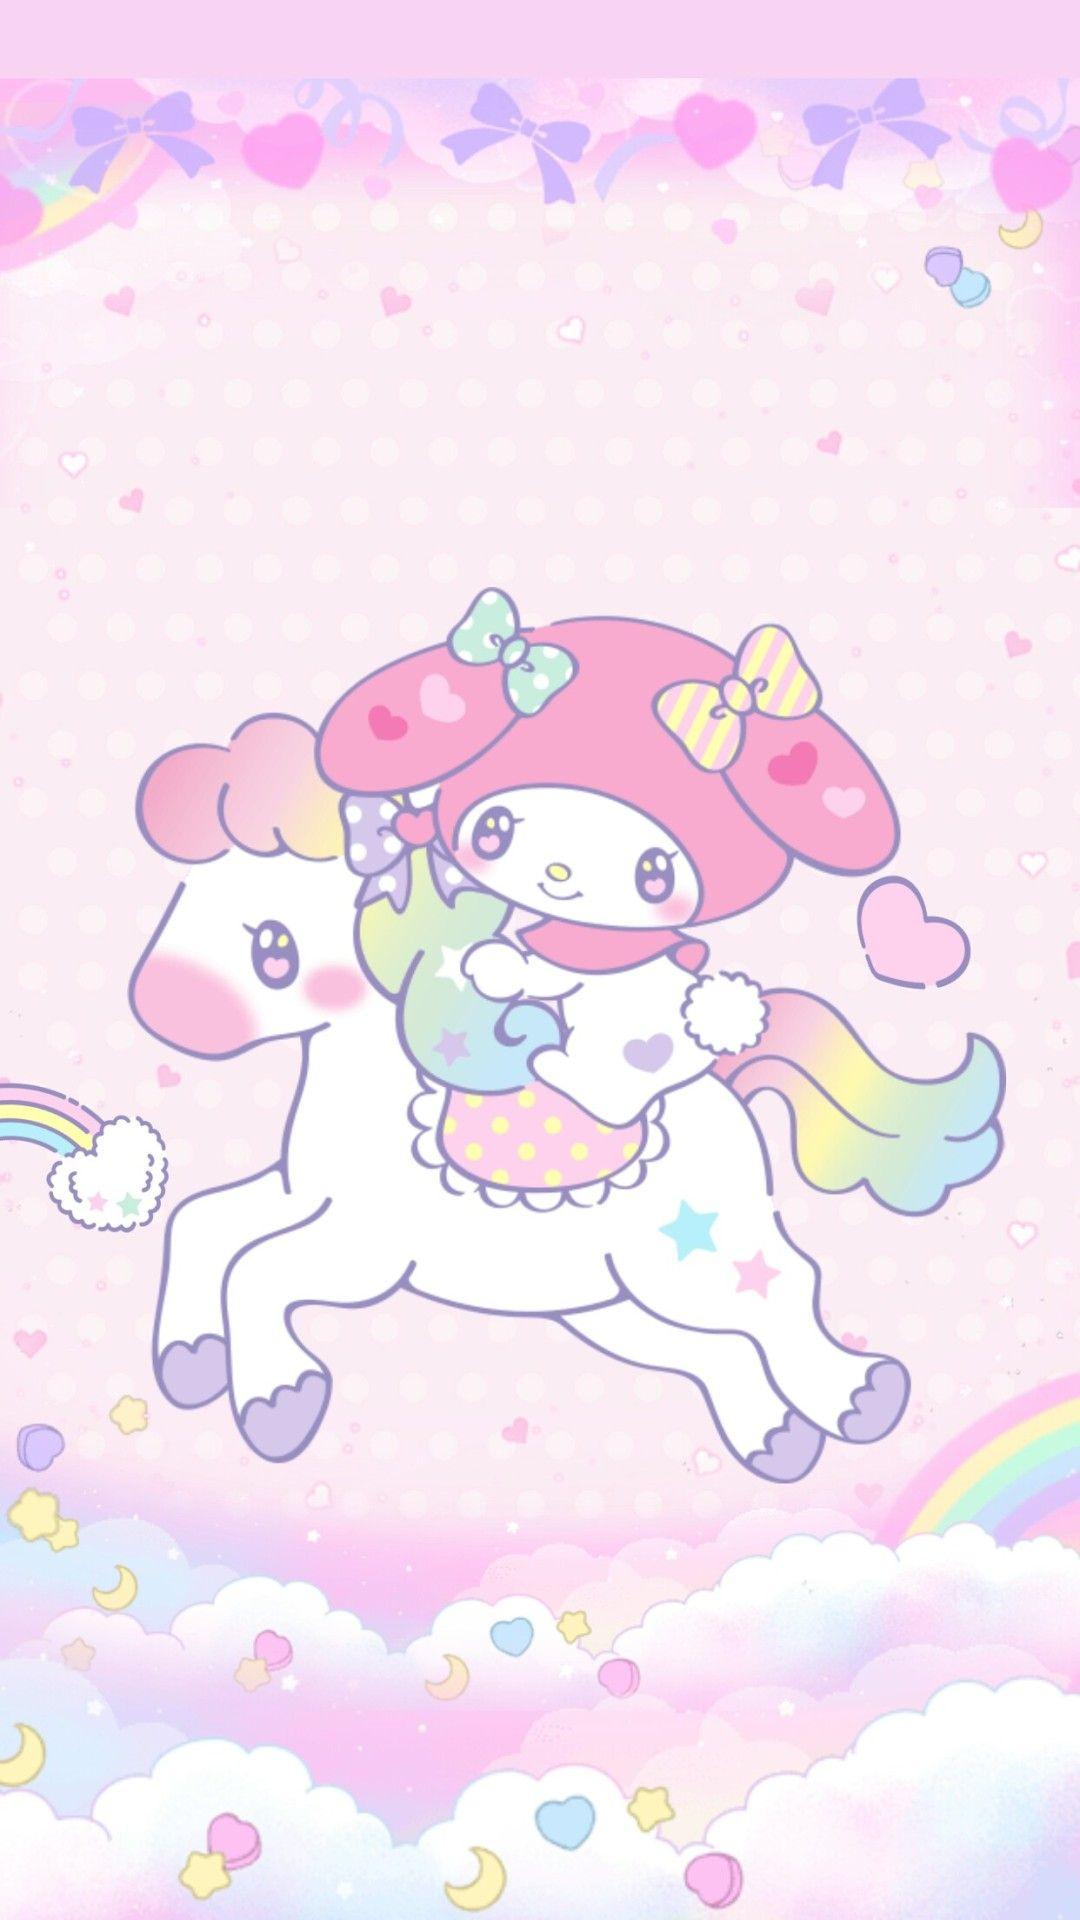 𝙹𝚎𝚗𝚗𝚕𝚘𝚟𝚎♡ — heymi243 My melody unicorn wallpaper by me